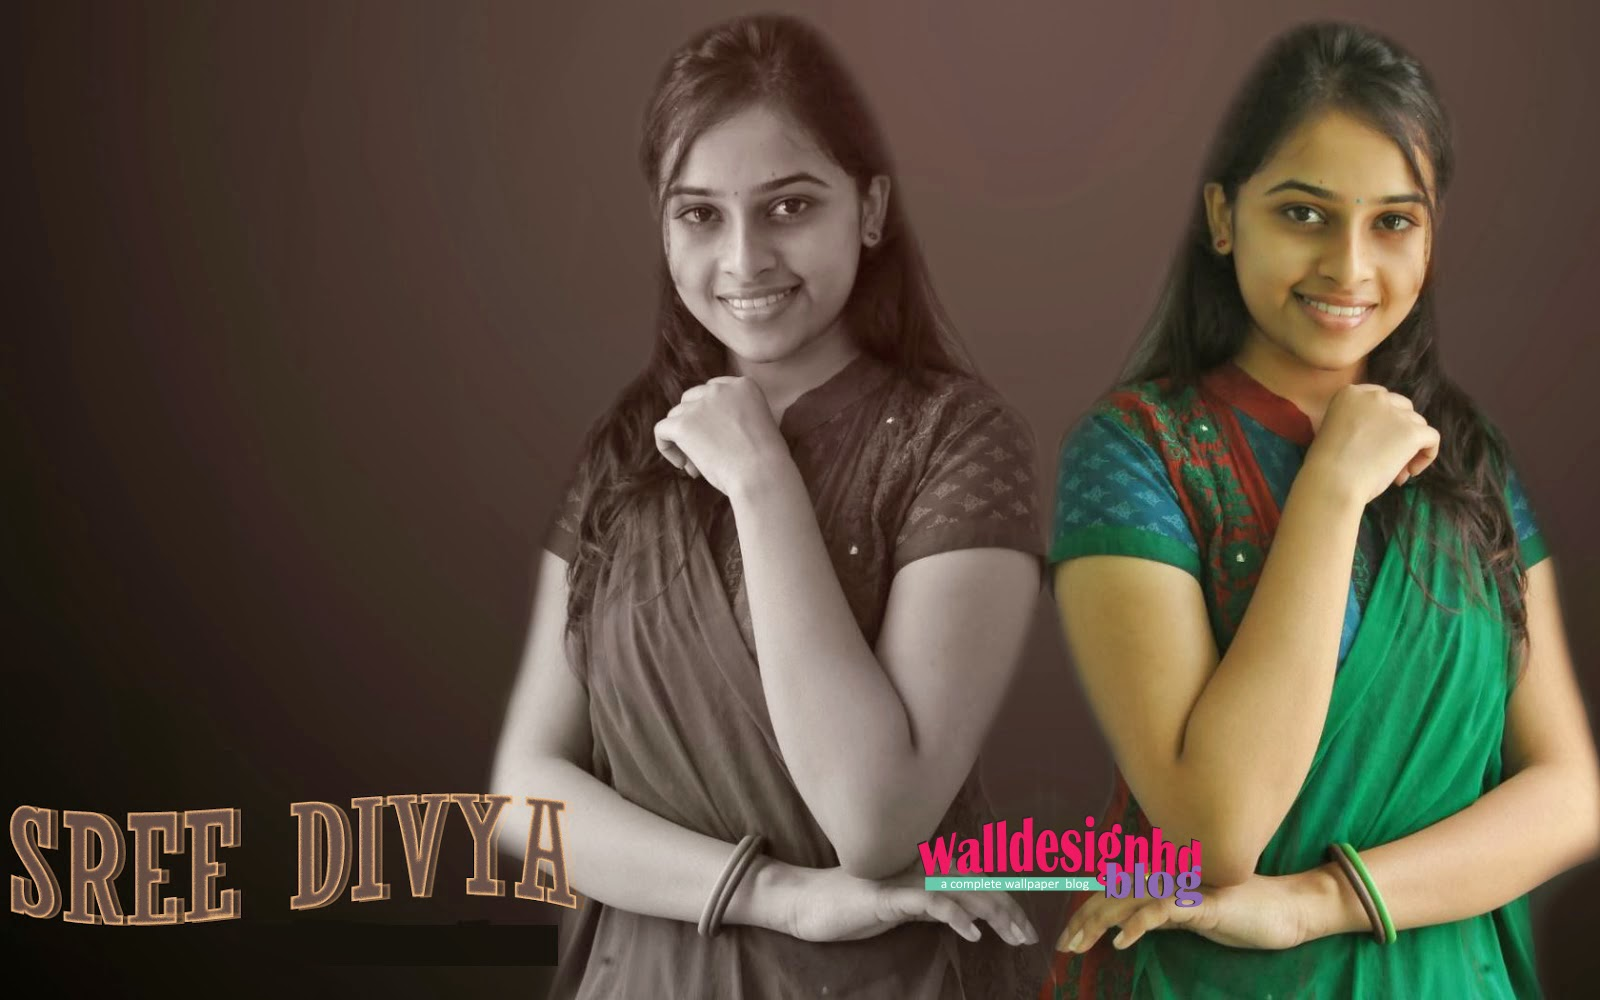 Wallpaper HD: Tamil actress Sri Divya